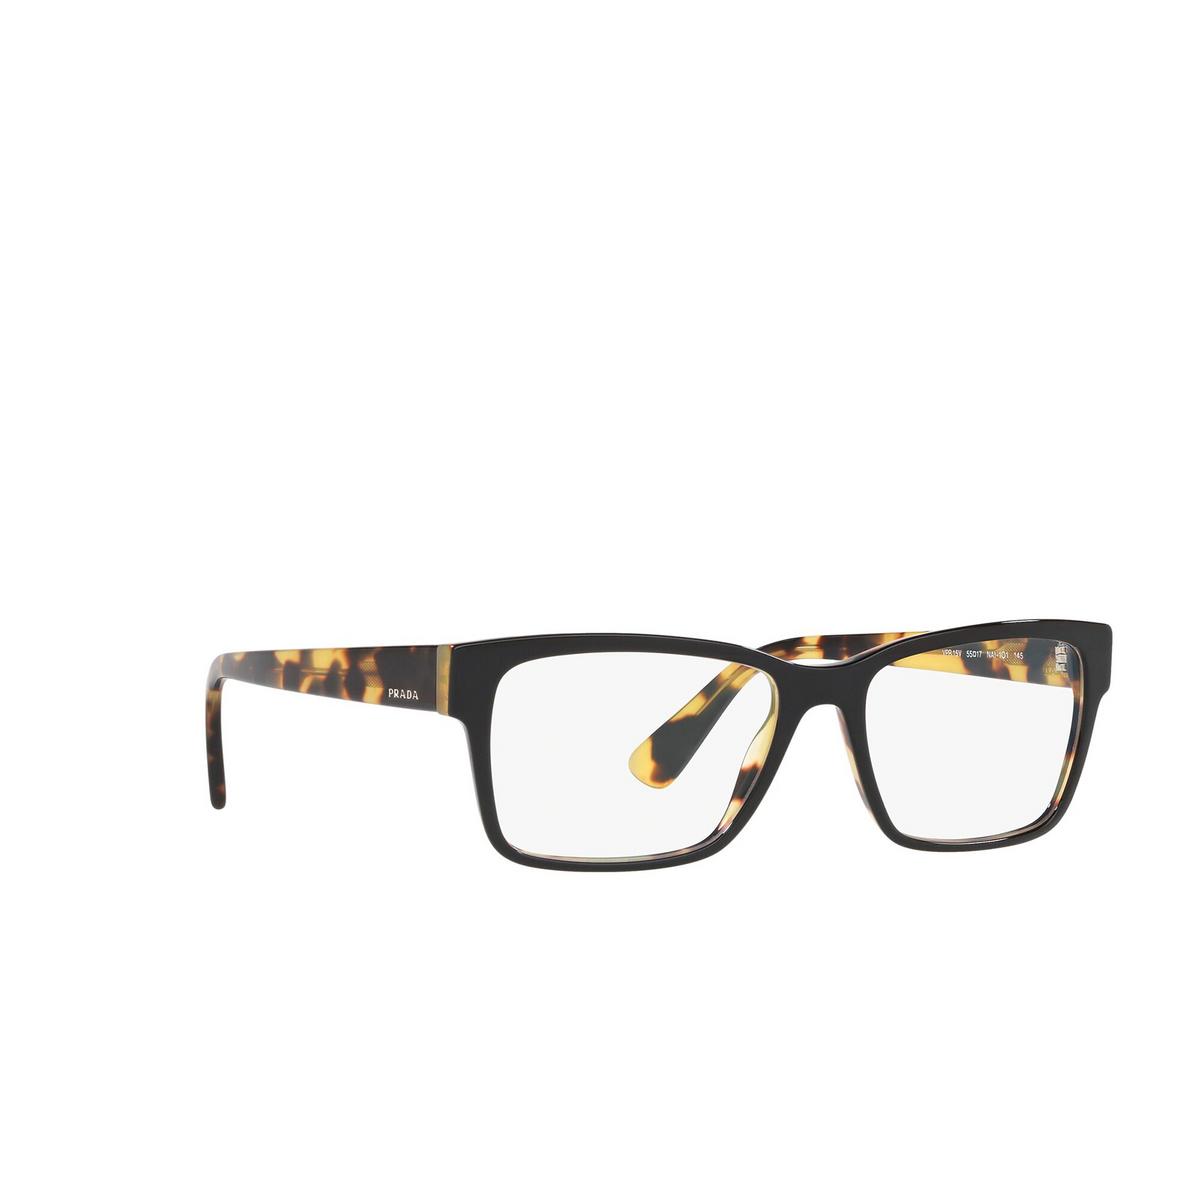 Prada® Rectangle Eyeglasses: Heritage PR 15VV color Top Black / Medium Havana NAI1O1 - three-quarters view.